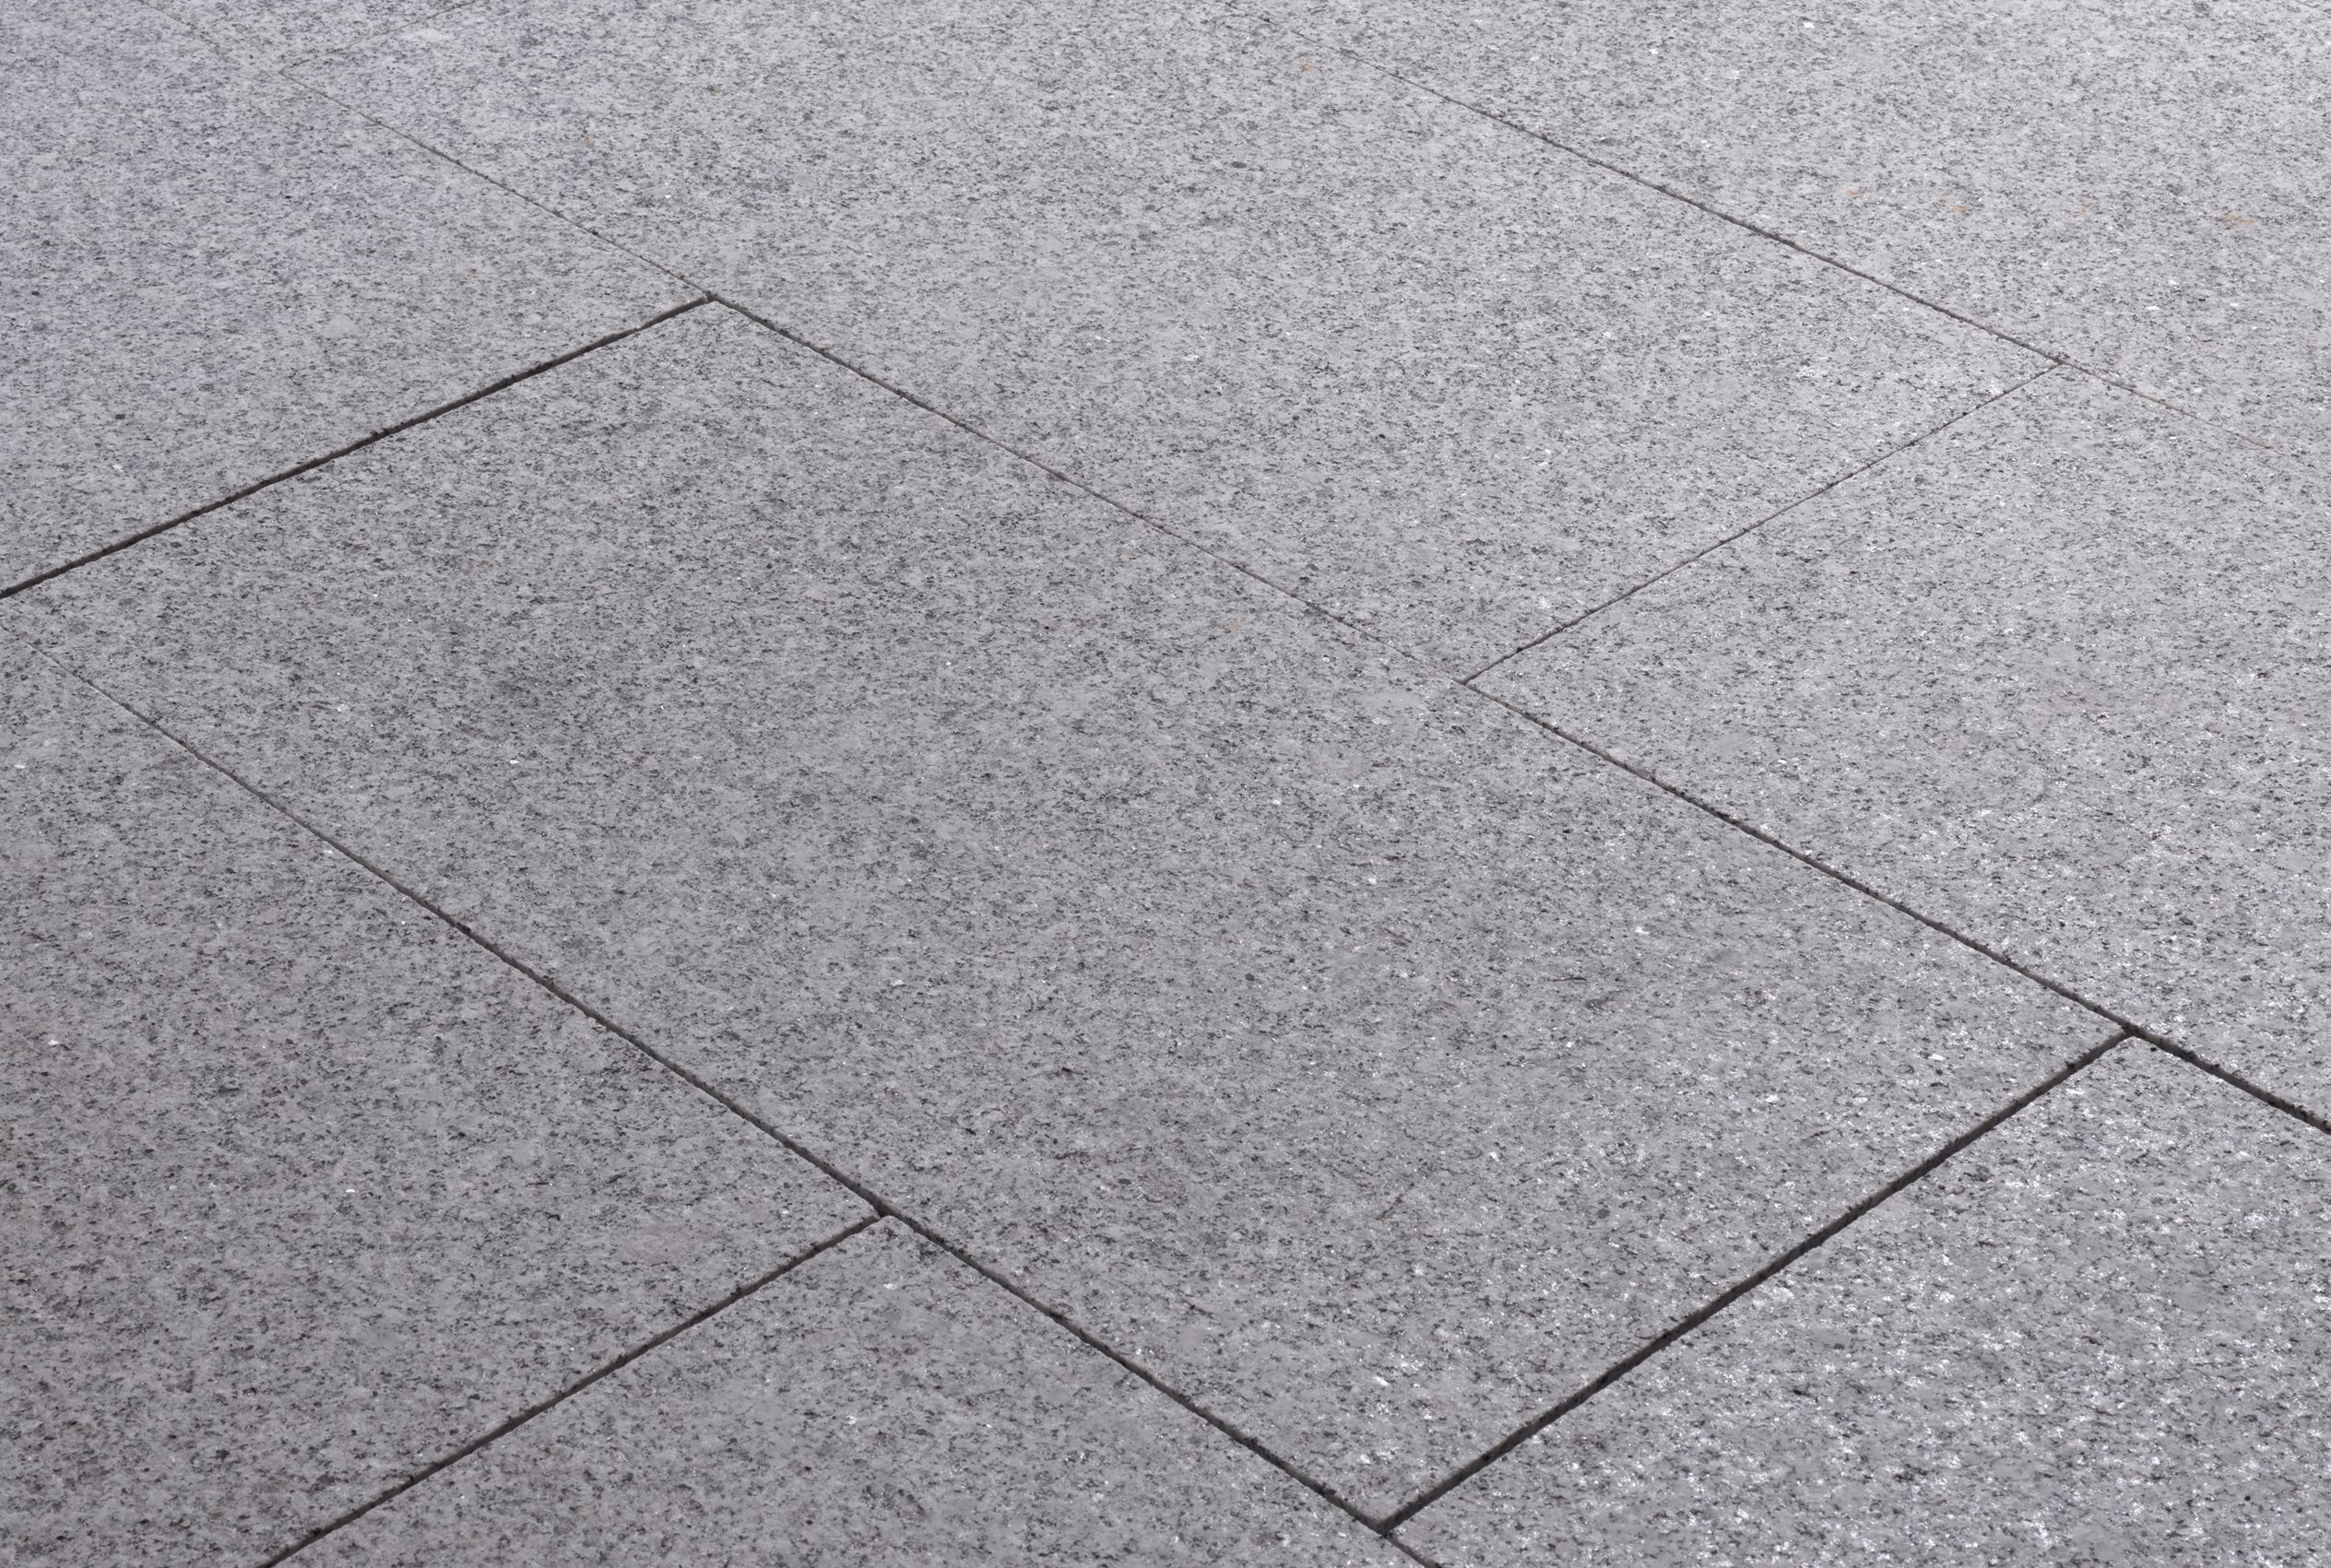 ... dallage granit gris bleu terrasse pierre dallage granit gris bleu